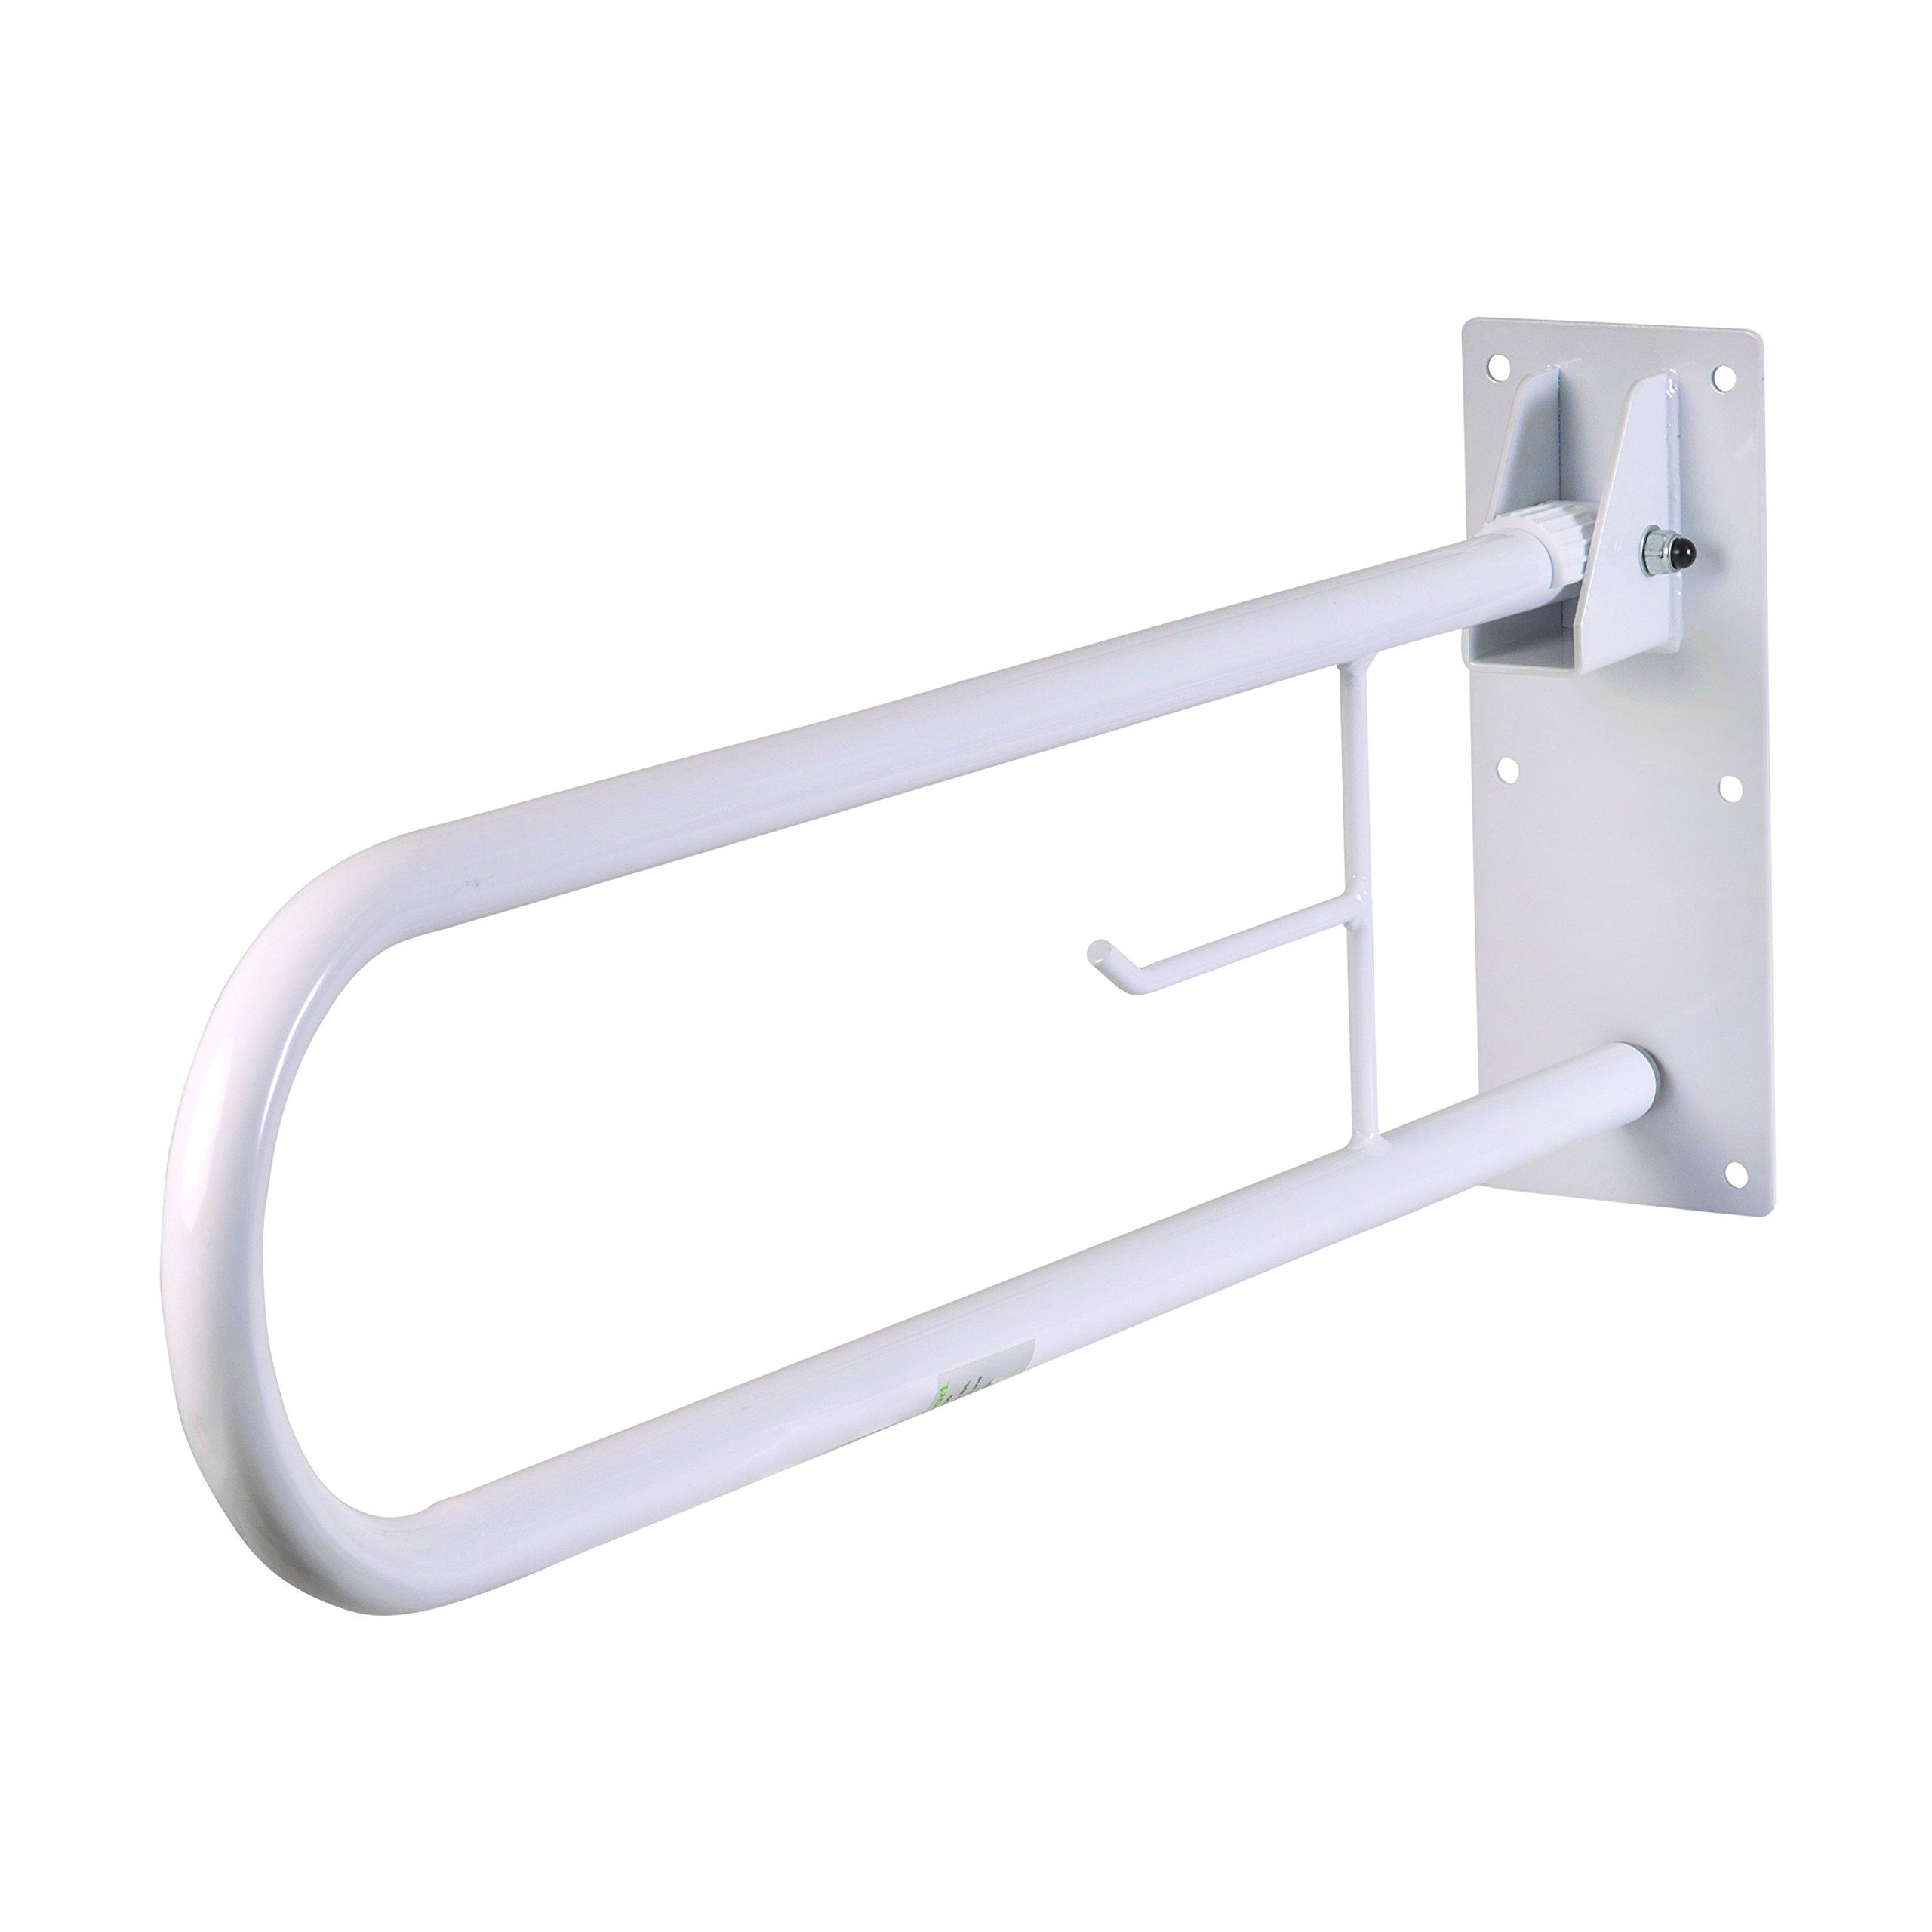 HealthSmart Fold Away Grab Bar Handrail Shower Safety Rail, White